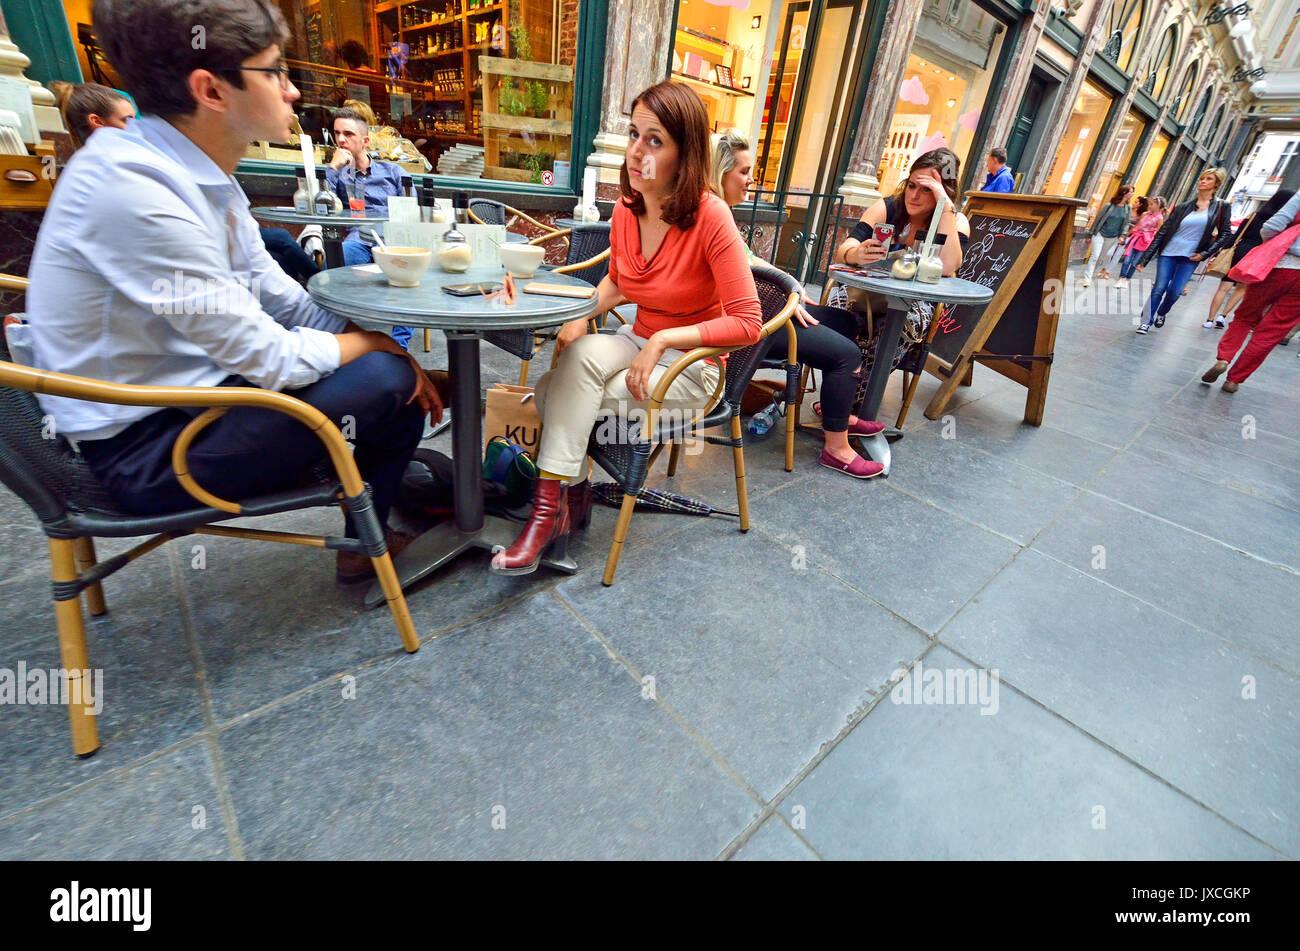 Brussels, Belgium. People sitting at cafe tables in Galeries Royales Saint-Hubert / Koninklijke Sint-Hubertusgalerijen Stock Photo